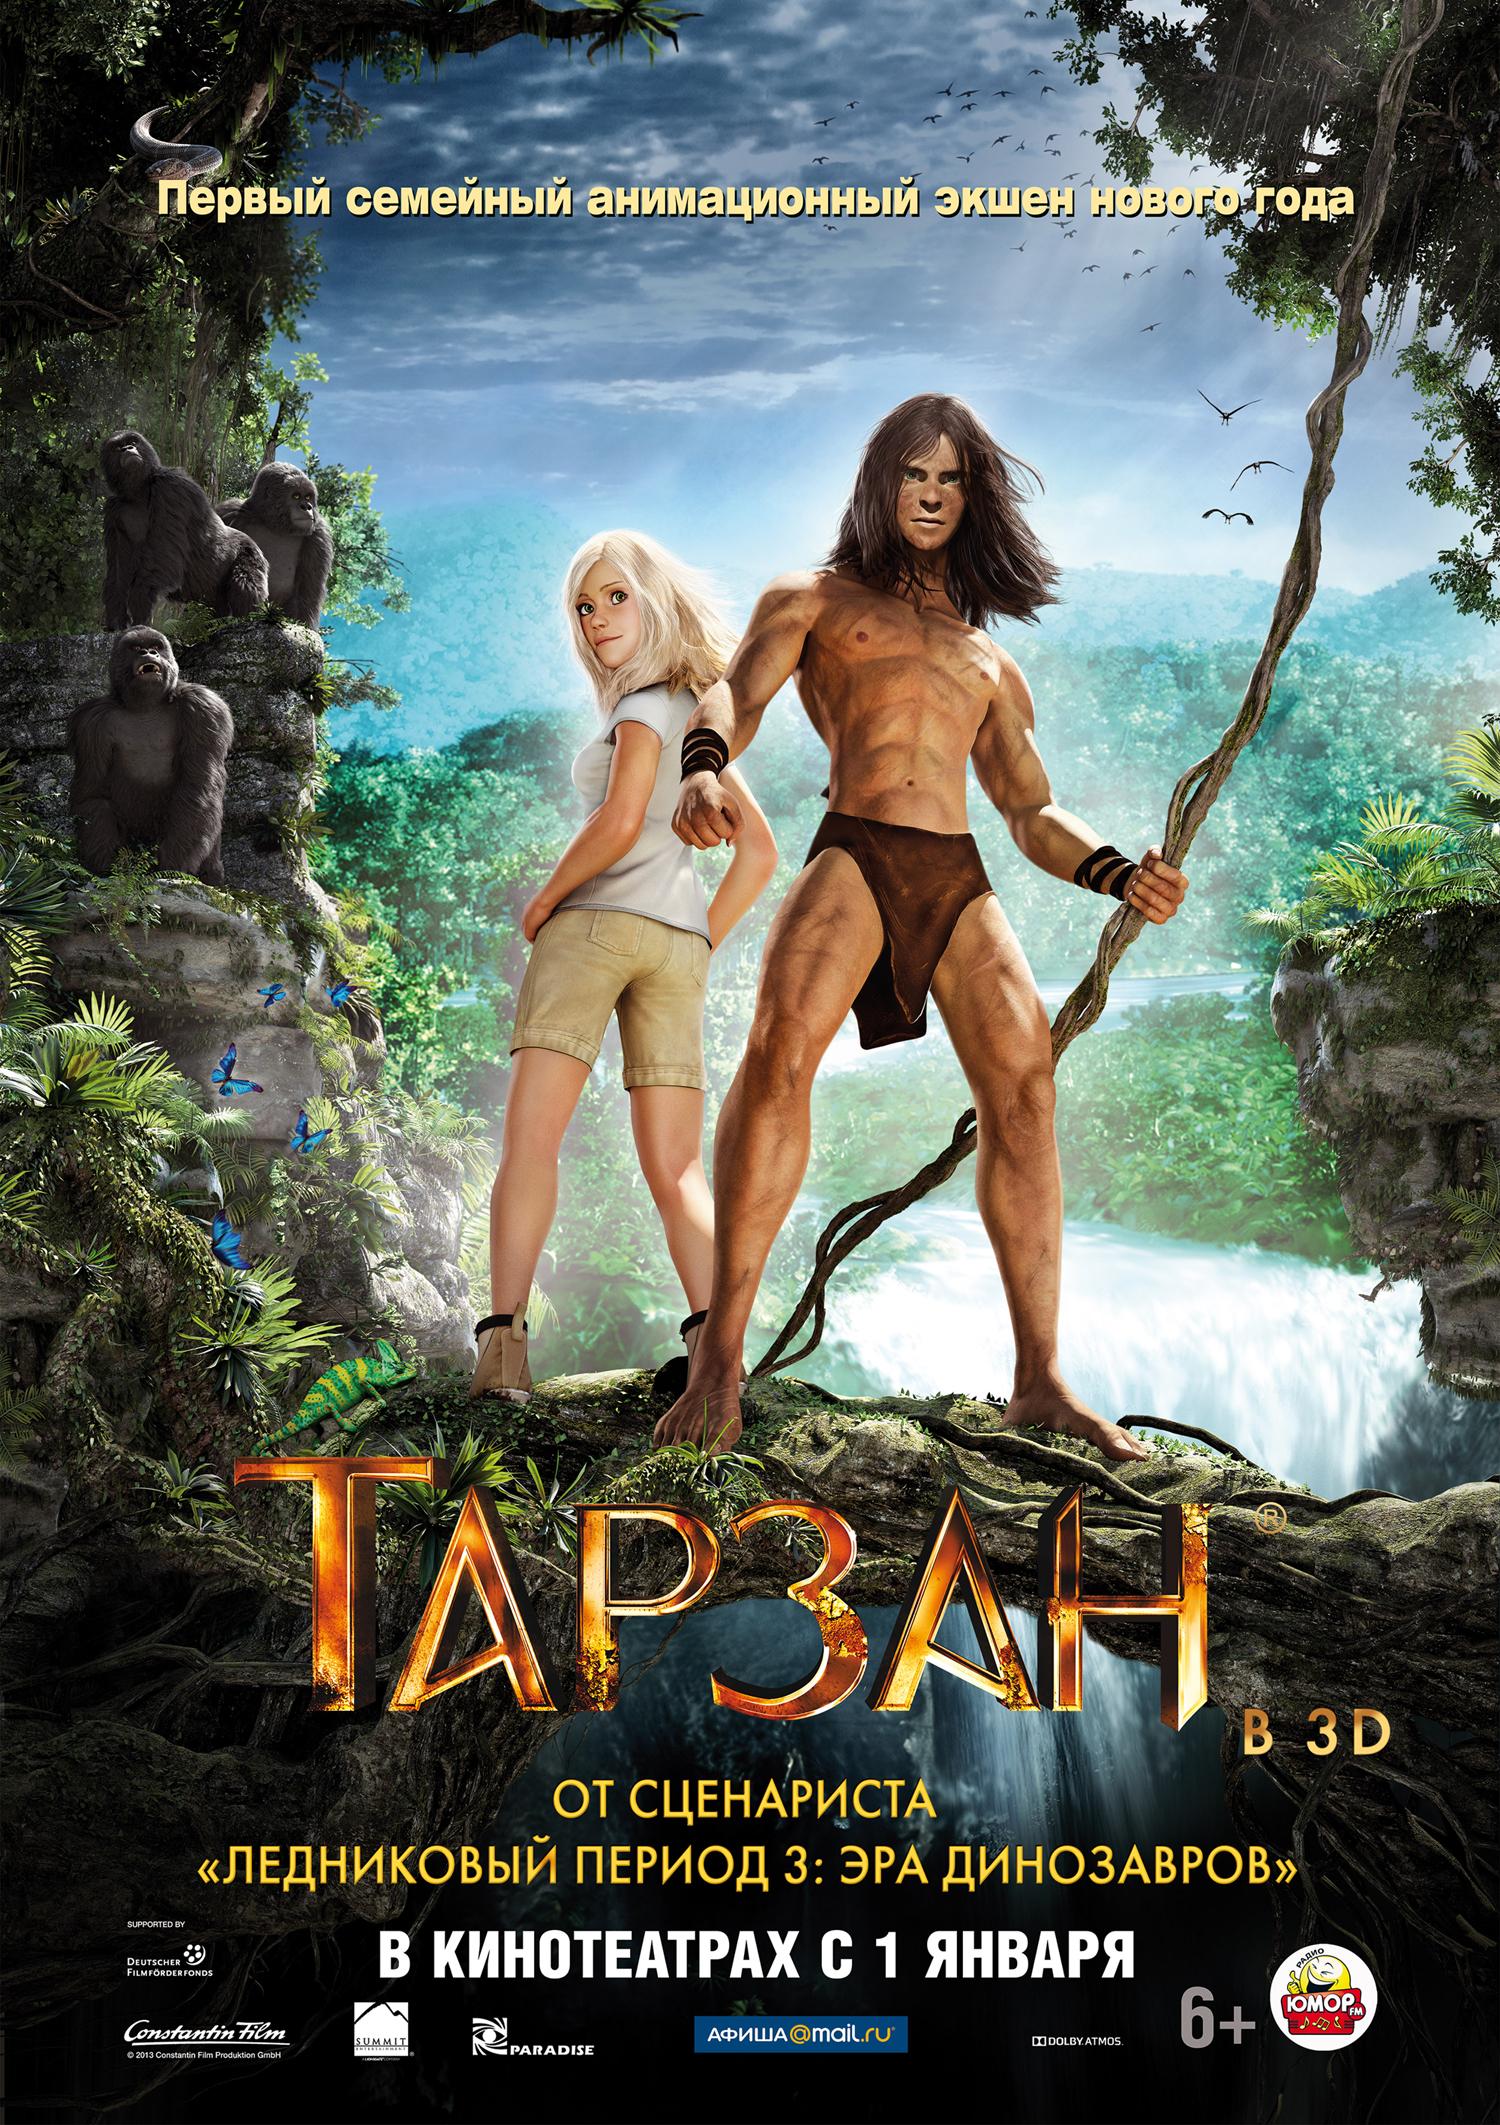 Тарзан членомонстр джунглей порно онлайн 12 фотография